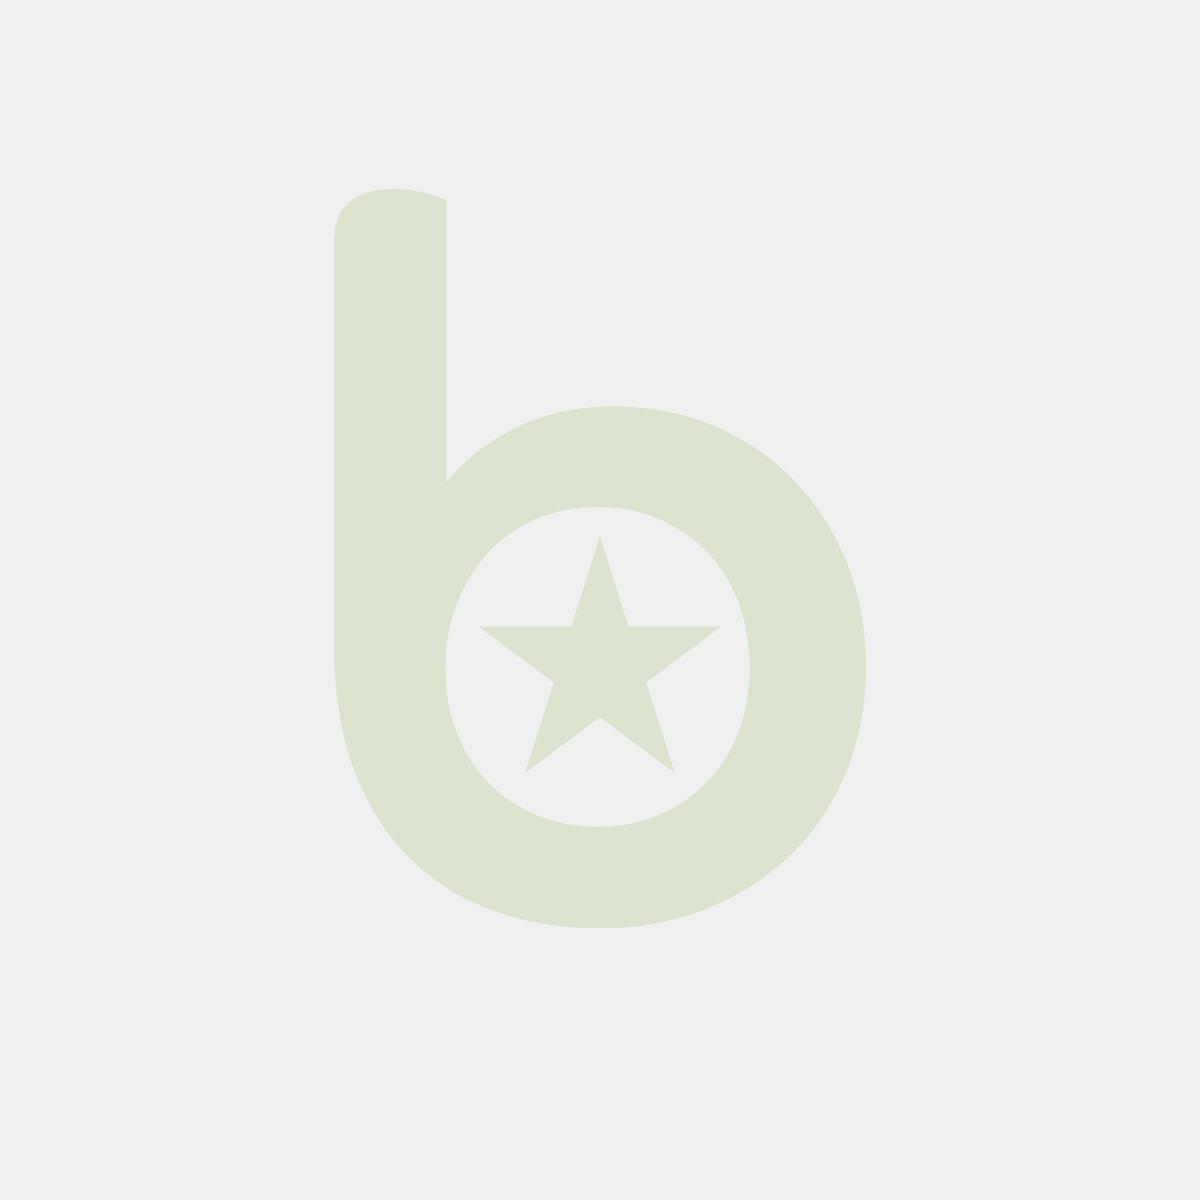 Gablota korkowa BI-Office 120x90cm